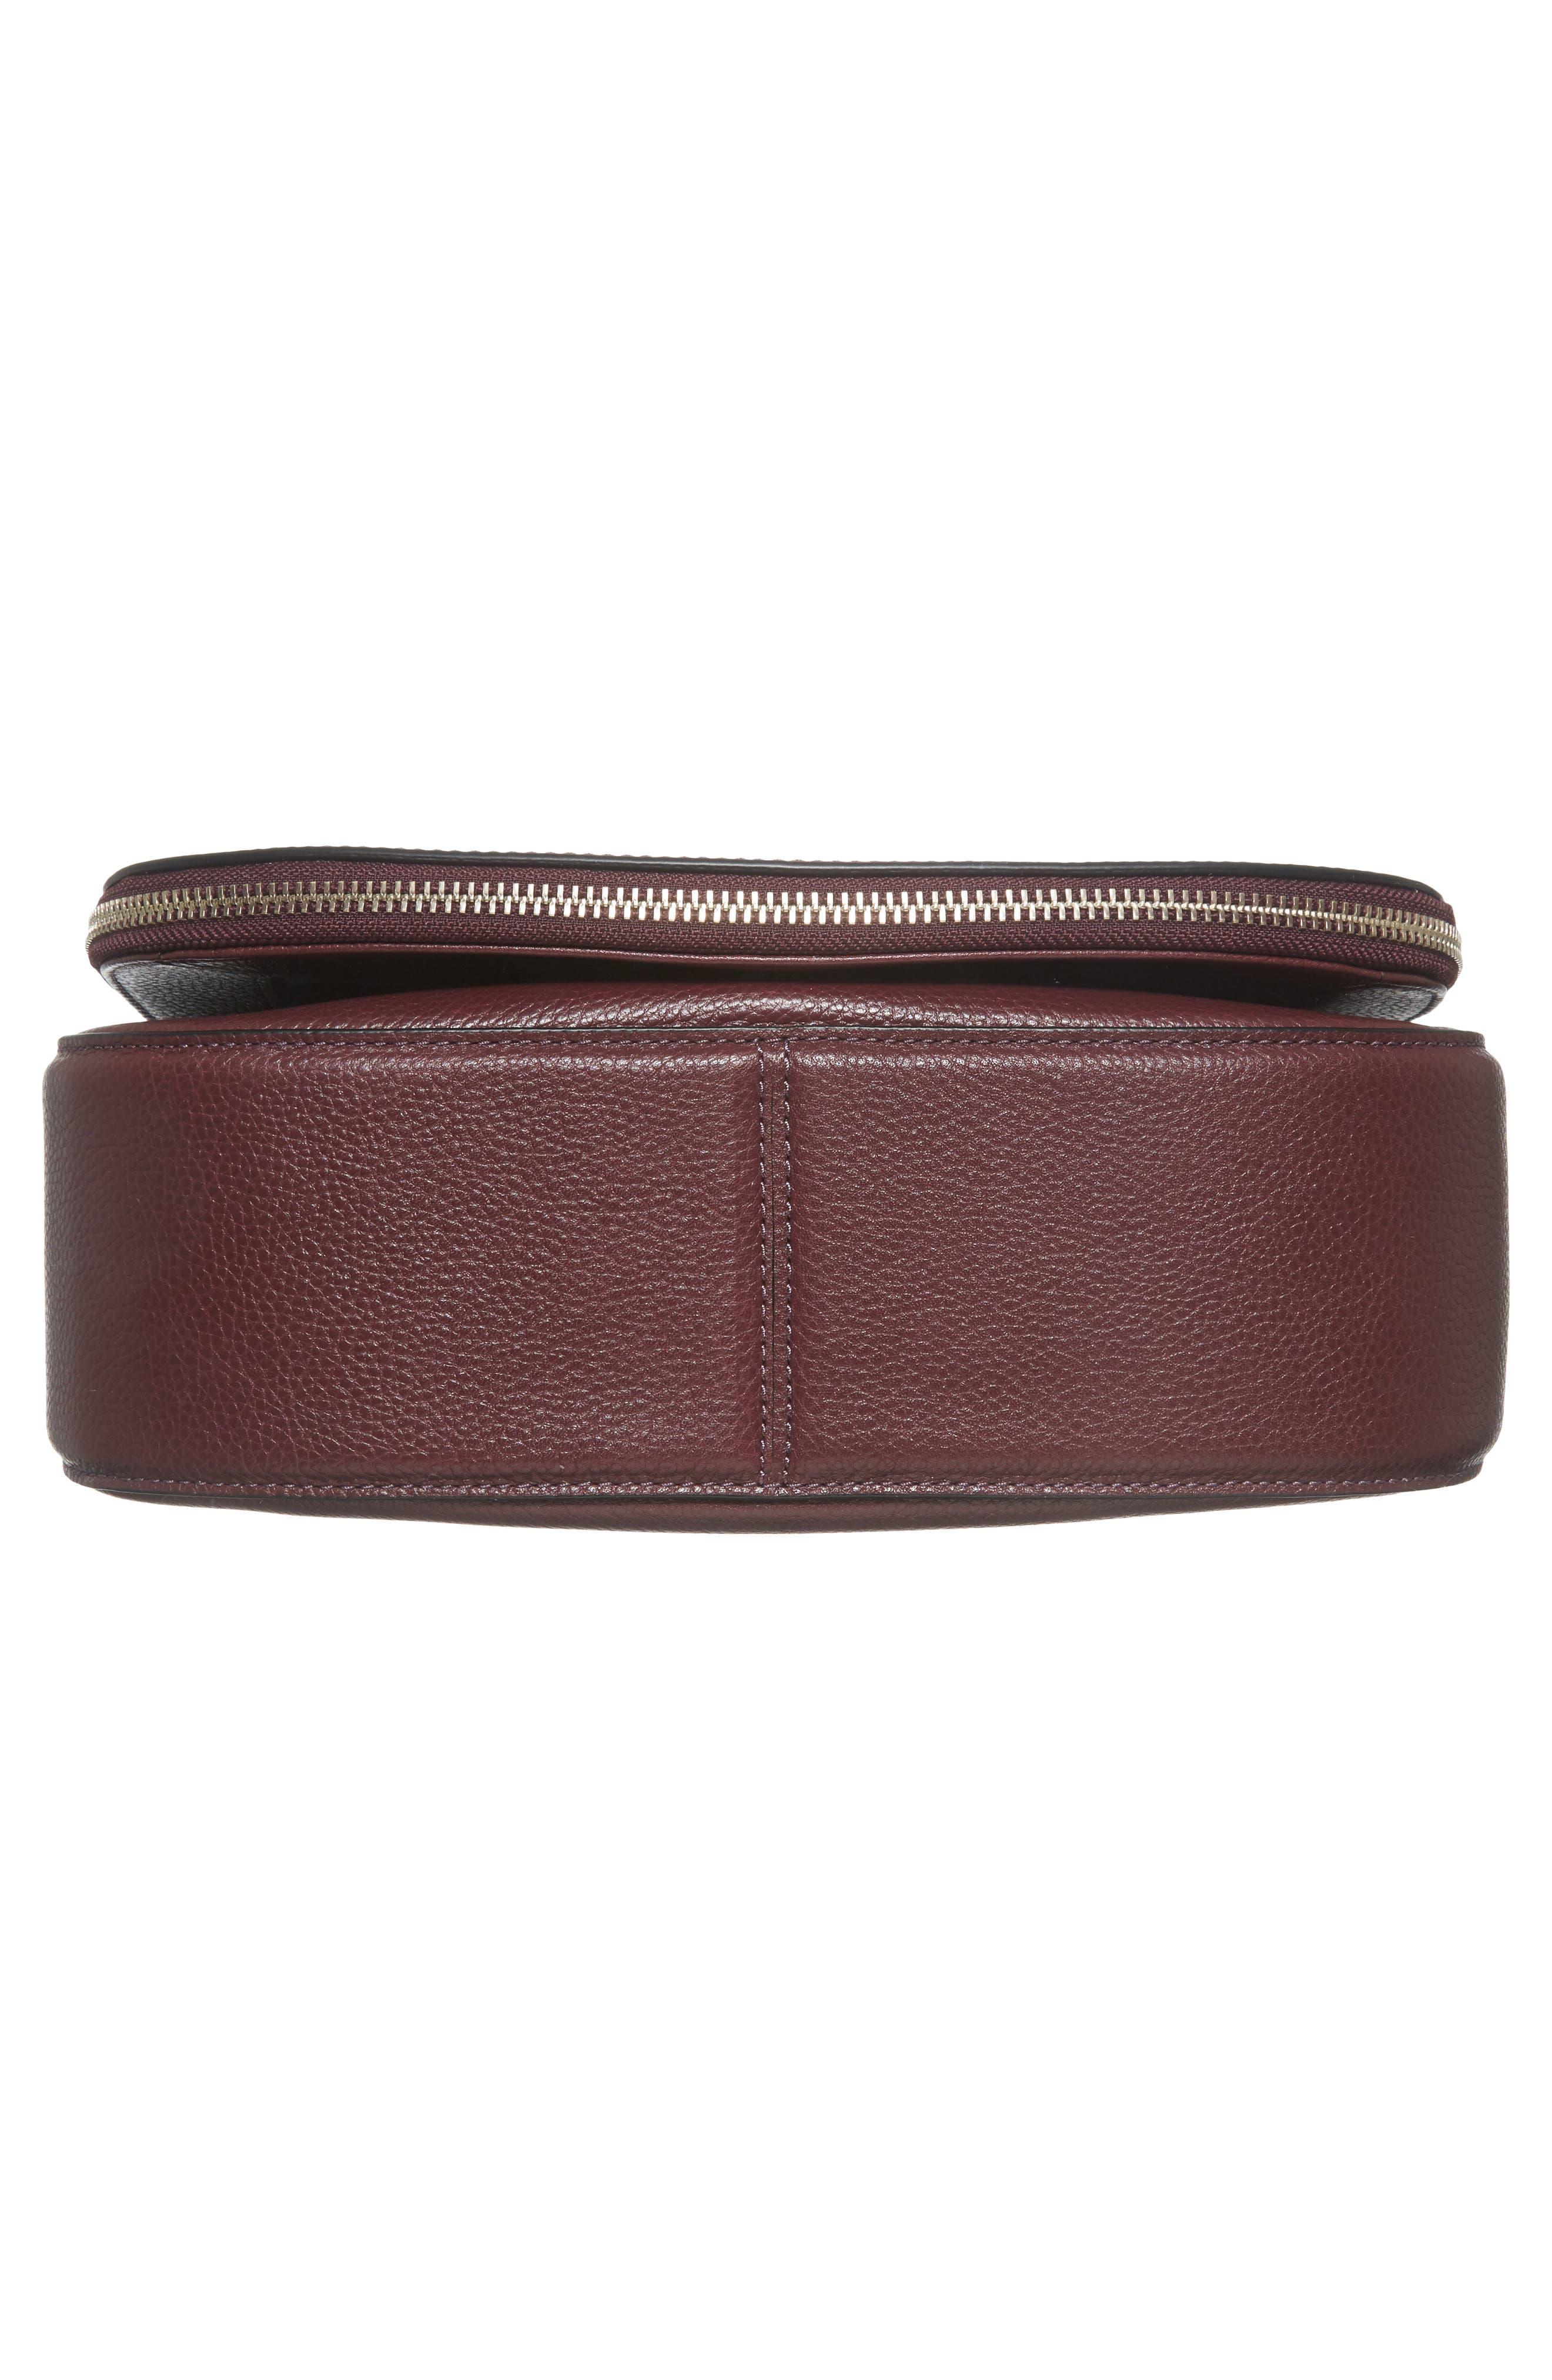 Recruit Nomad Pebbled Leather Crossbody Bag,                             Alternate thumbnail 6, color,                             538